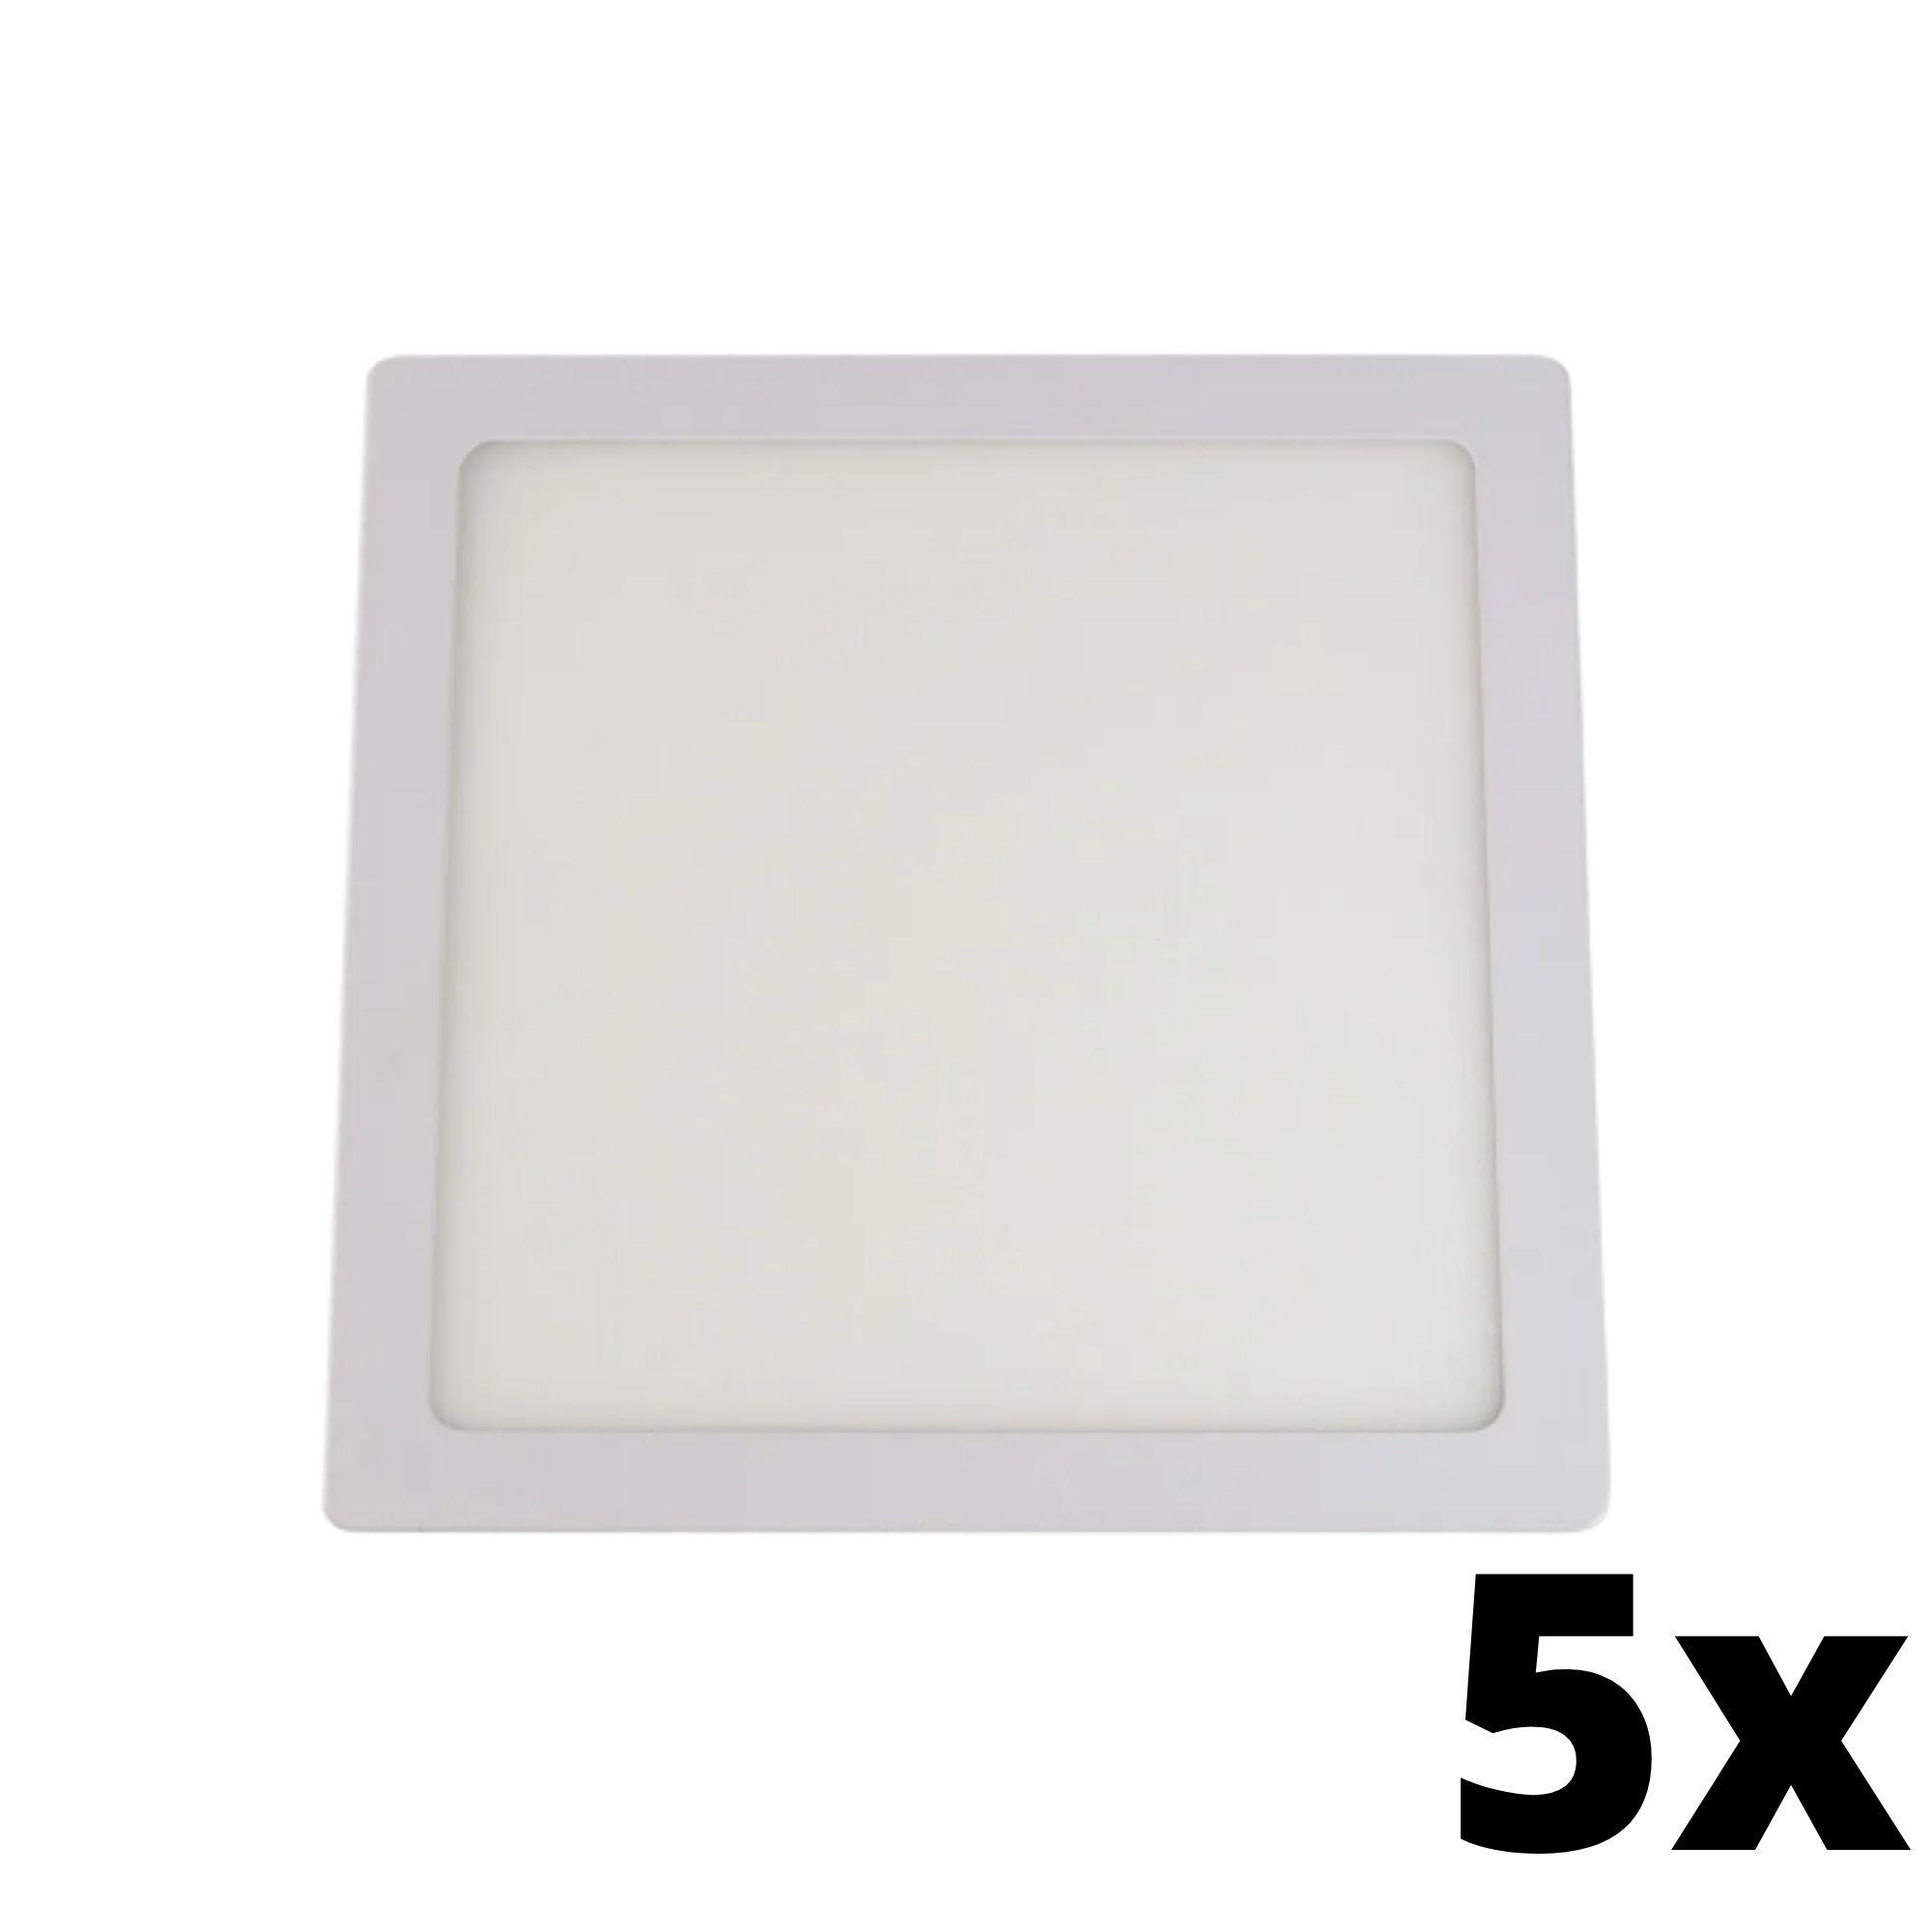 Kit 5 und Painel de Led Embutir 18w Quadrado 6500k